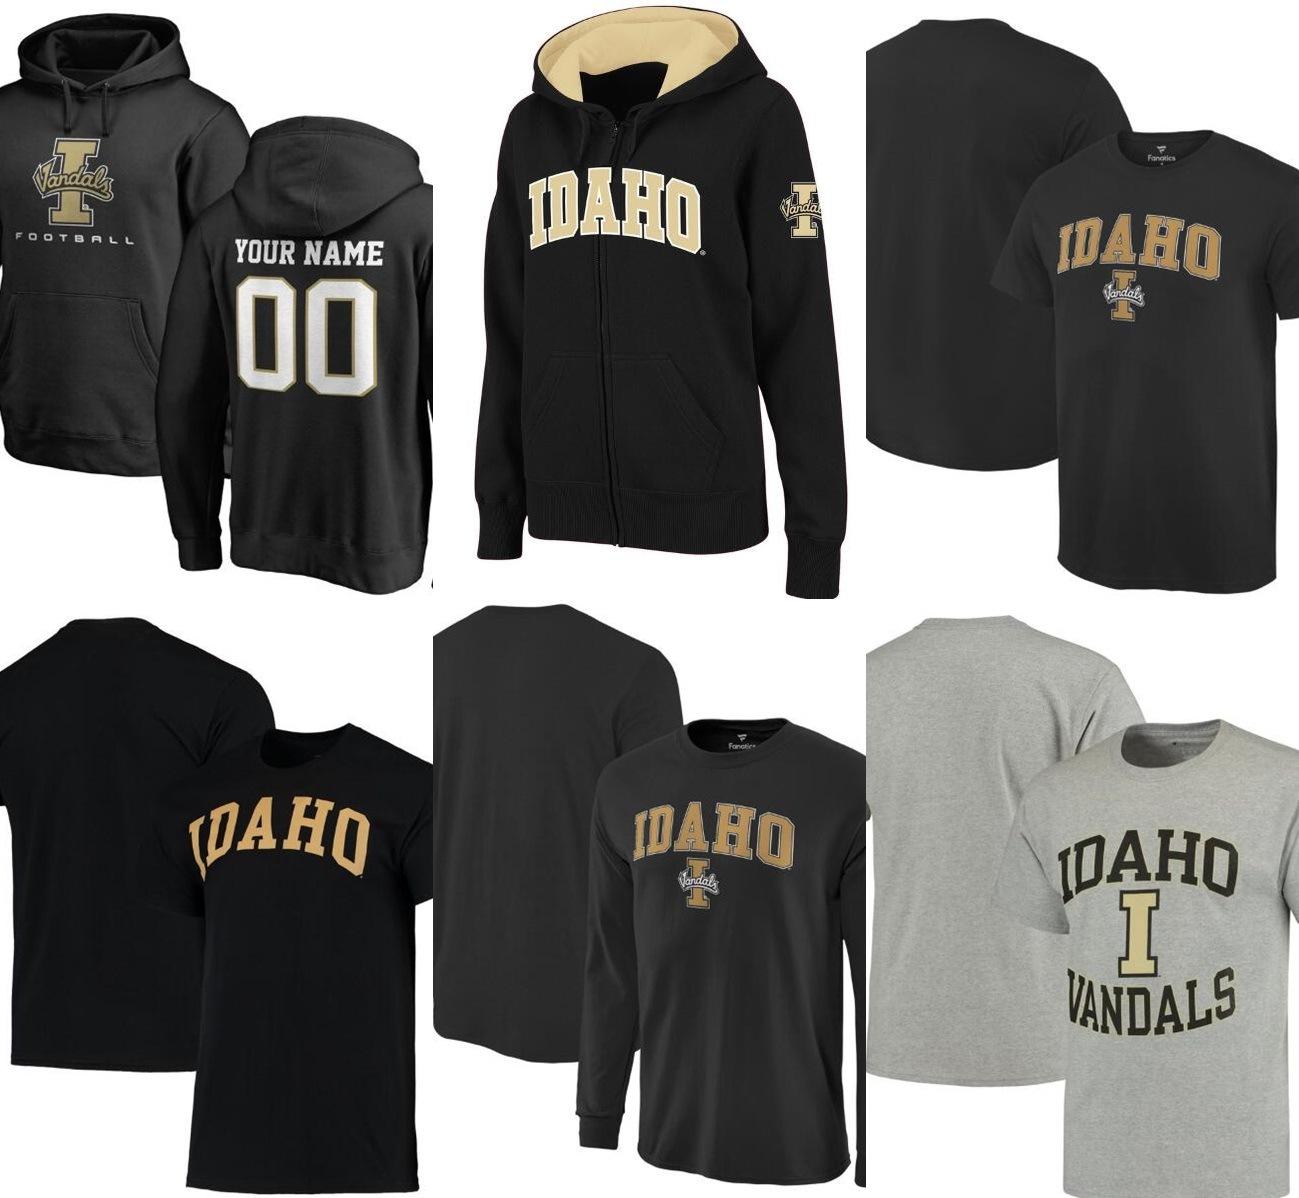 Idaho Vandals Black Basketball Jersey